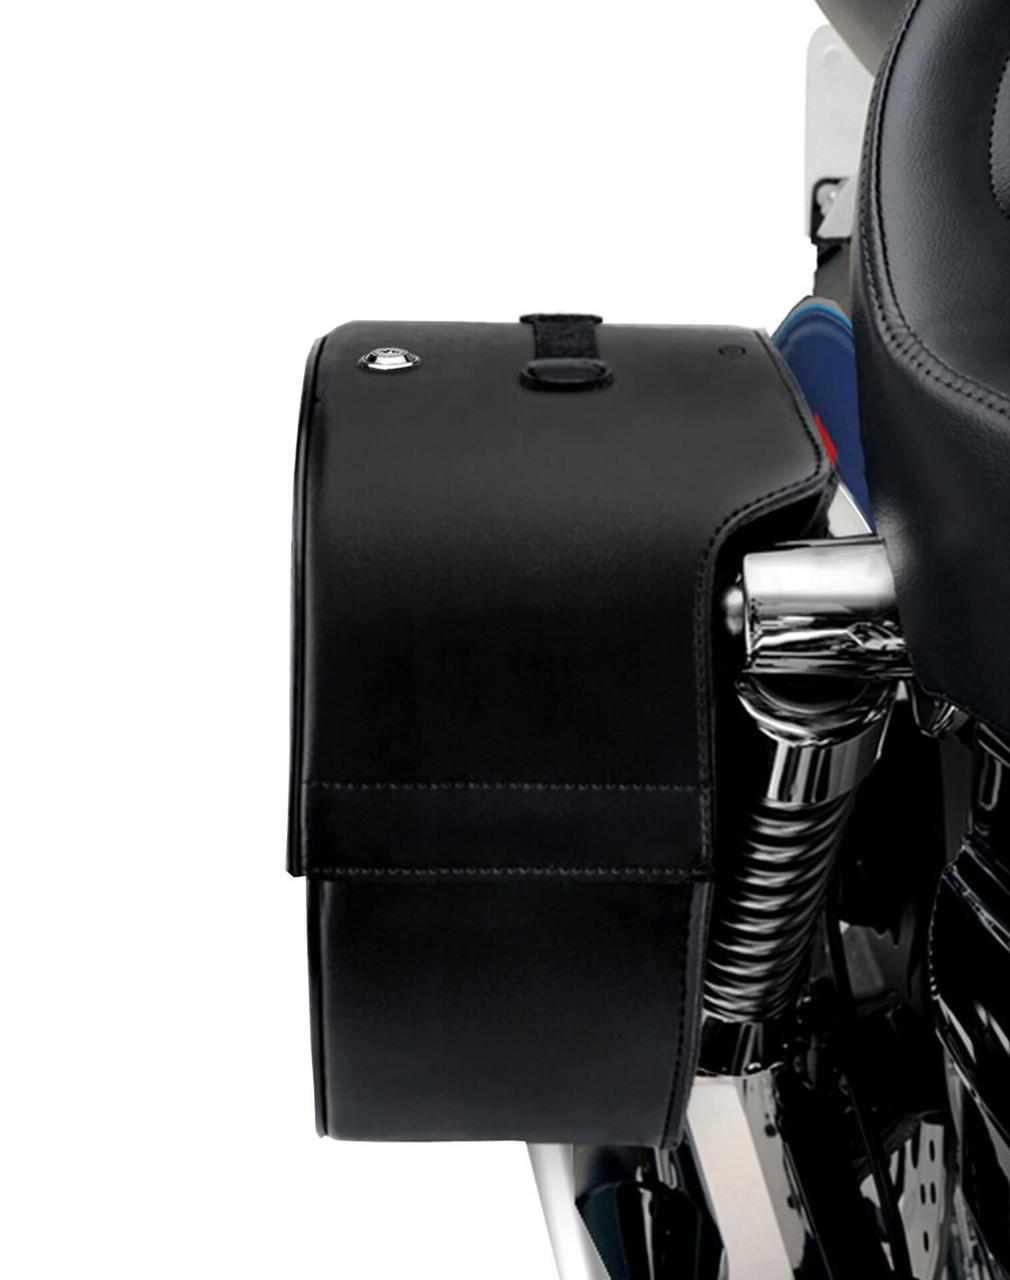 Kawasaki Vulcan 750 Spear Shock Cutout Large Motorcycle Saddlebags Shock Cutout View